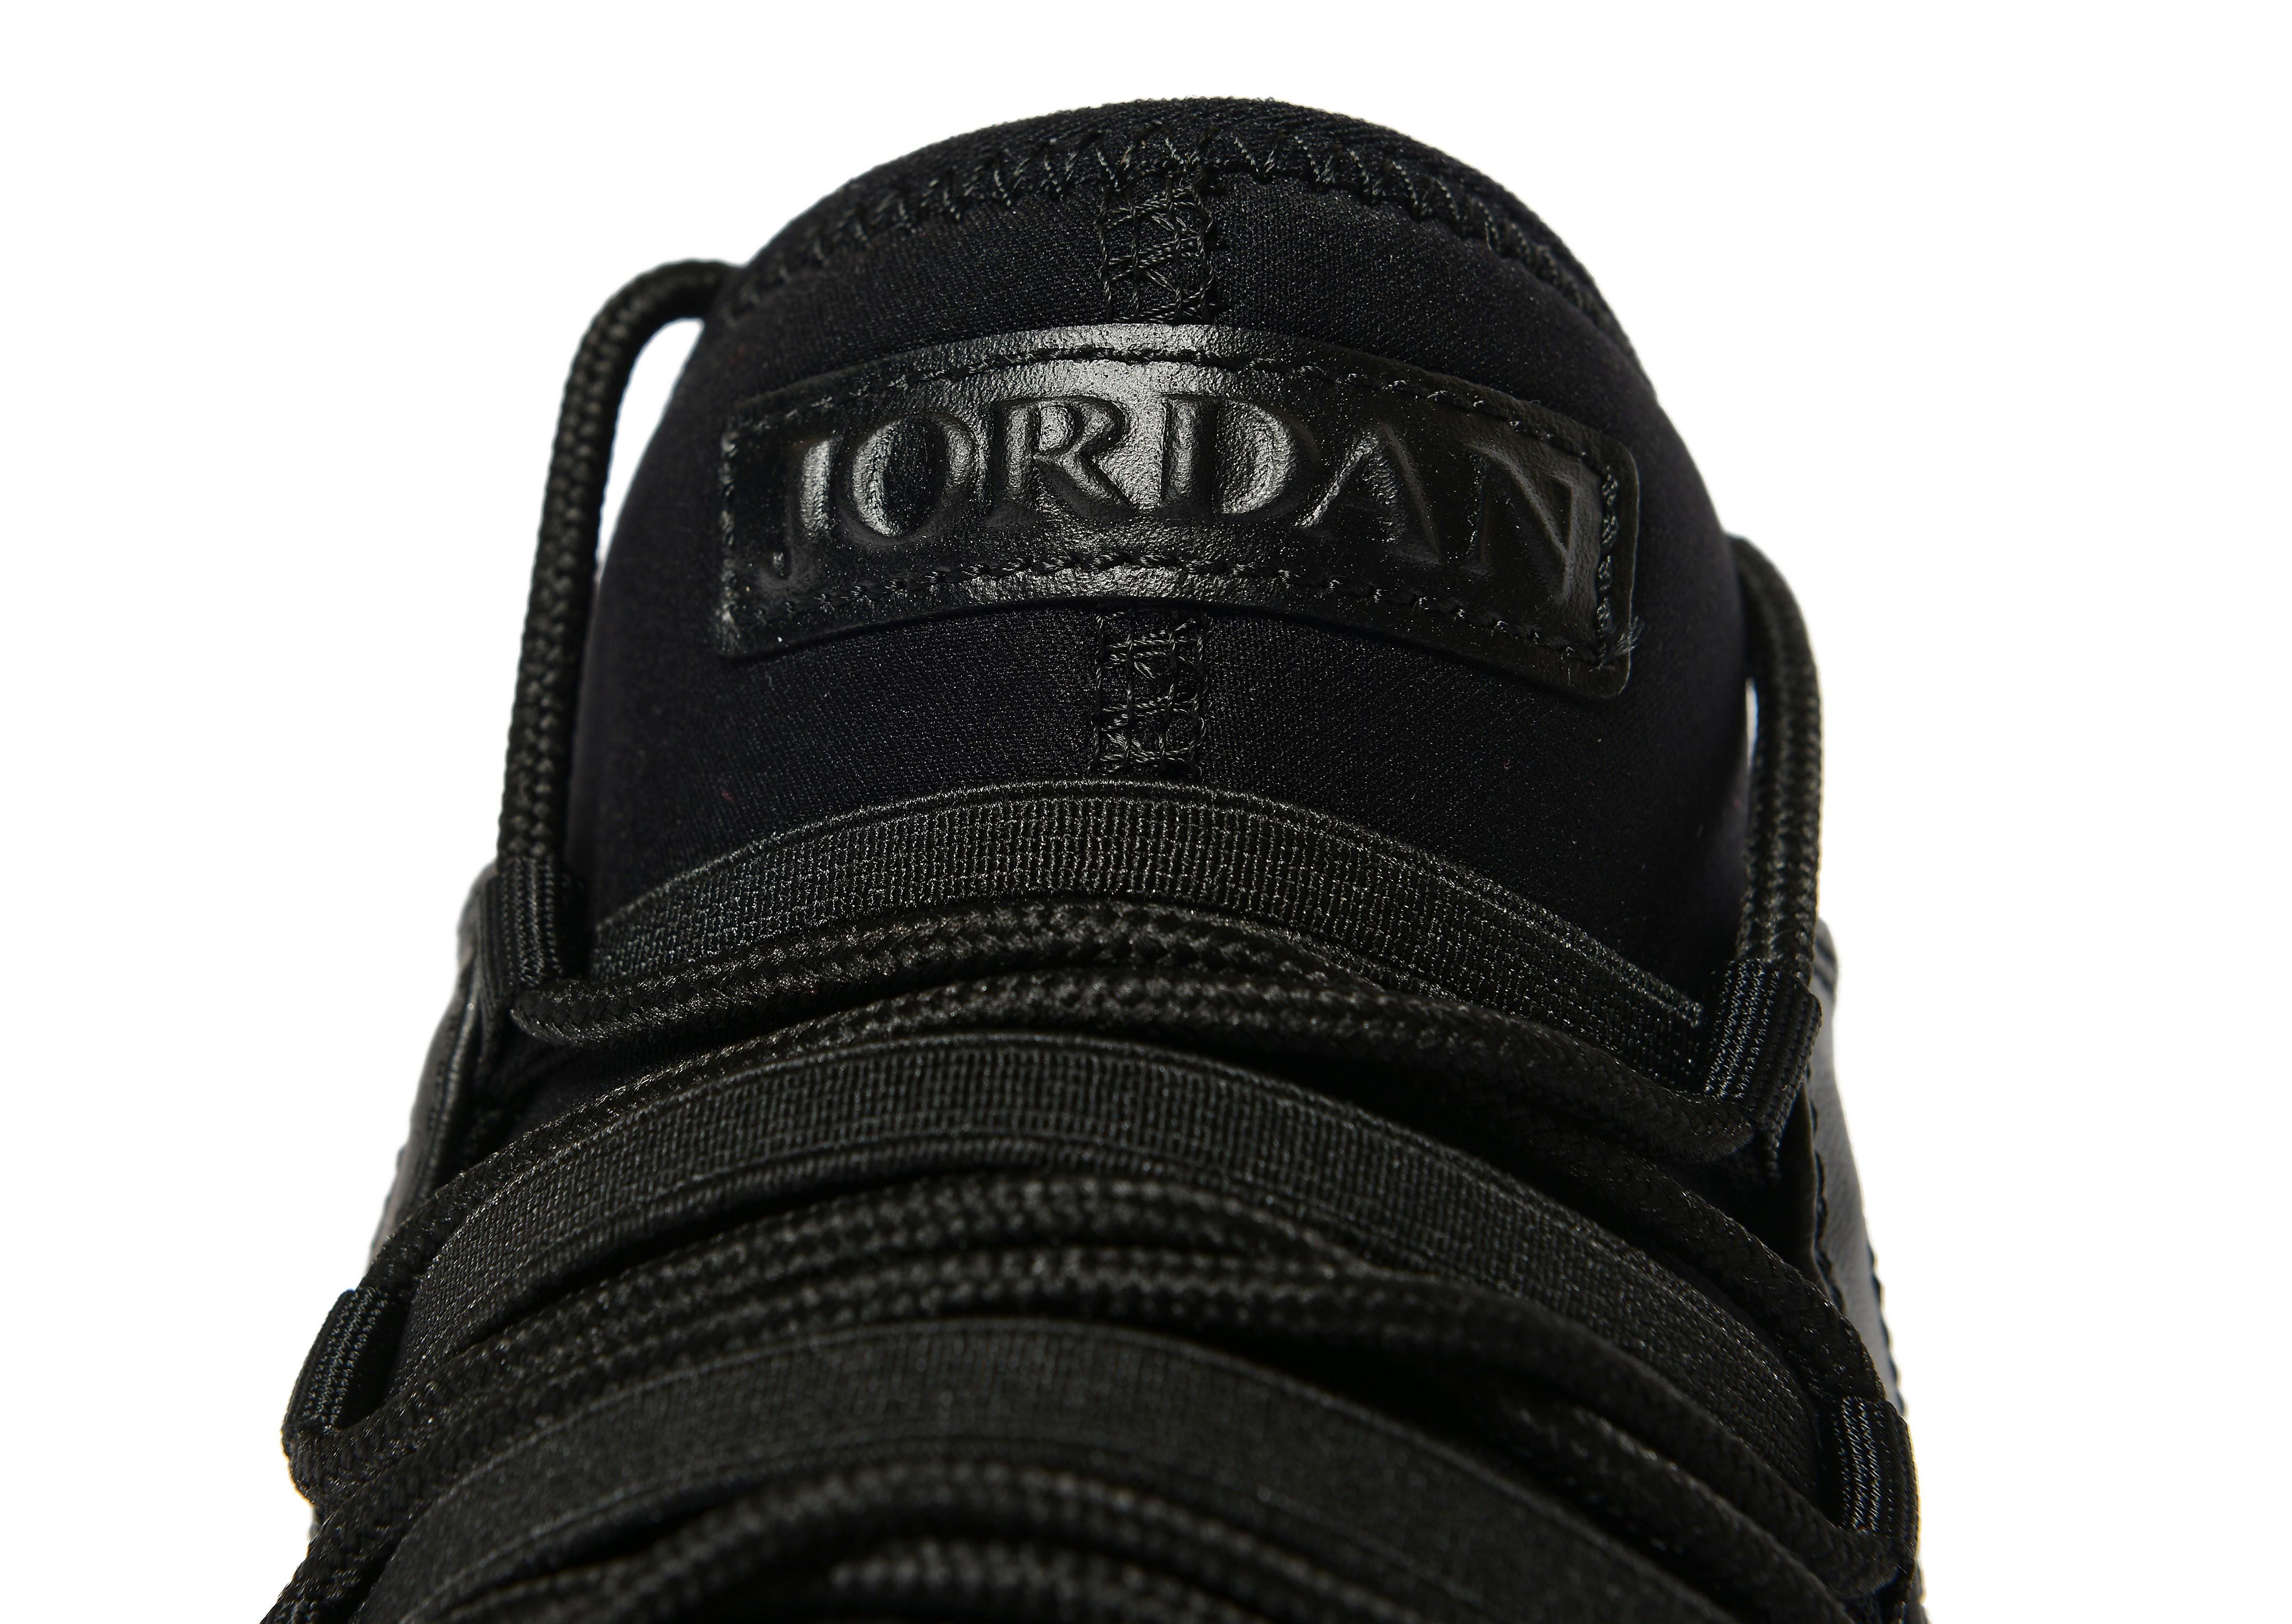 Nike Jordan Formula 23